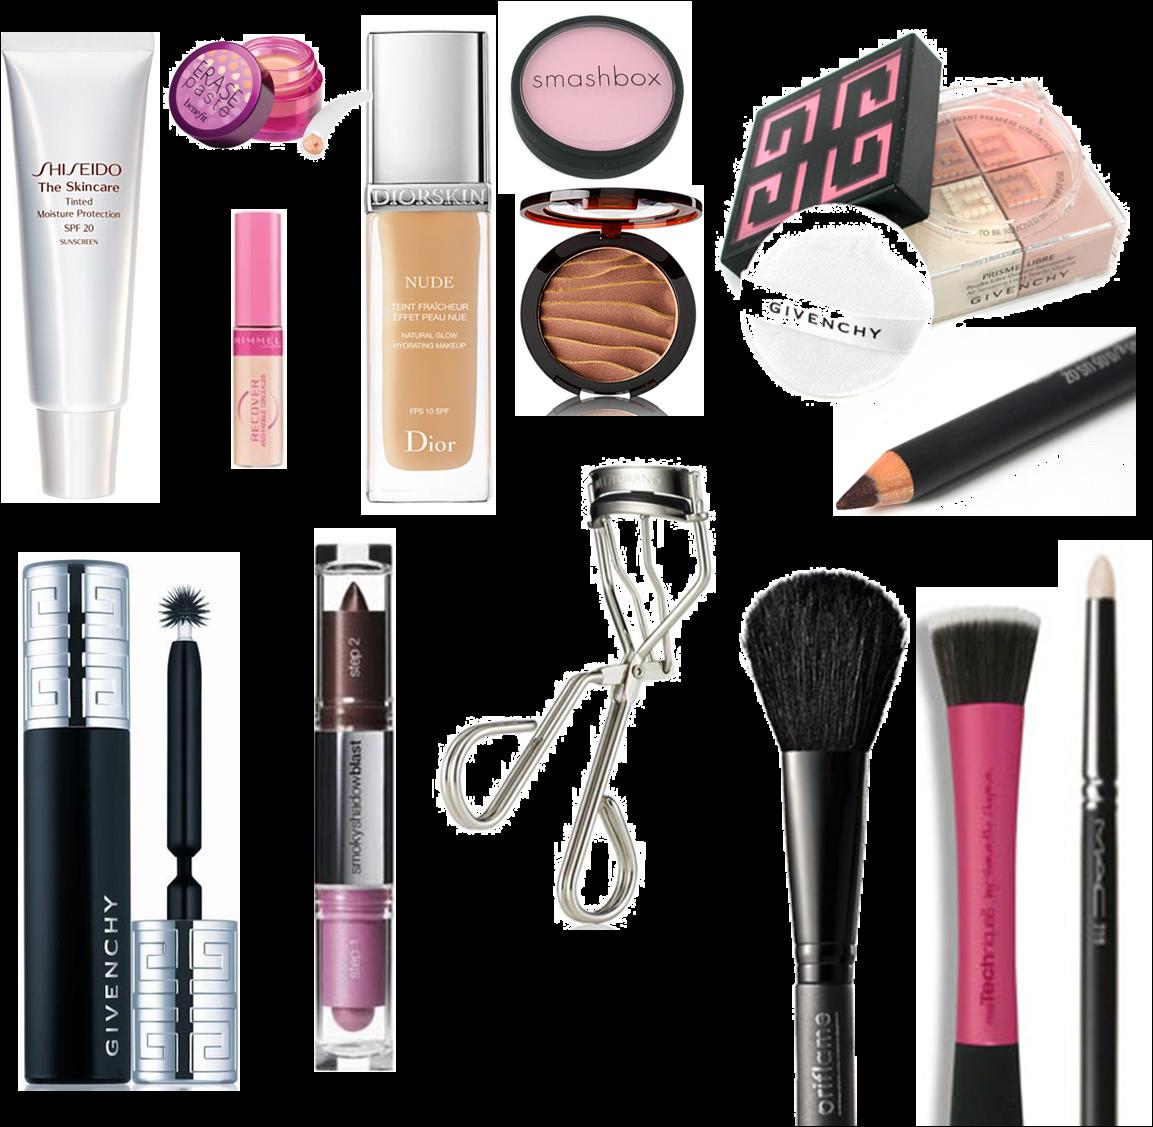 shiseido productos